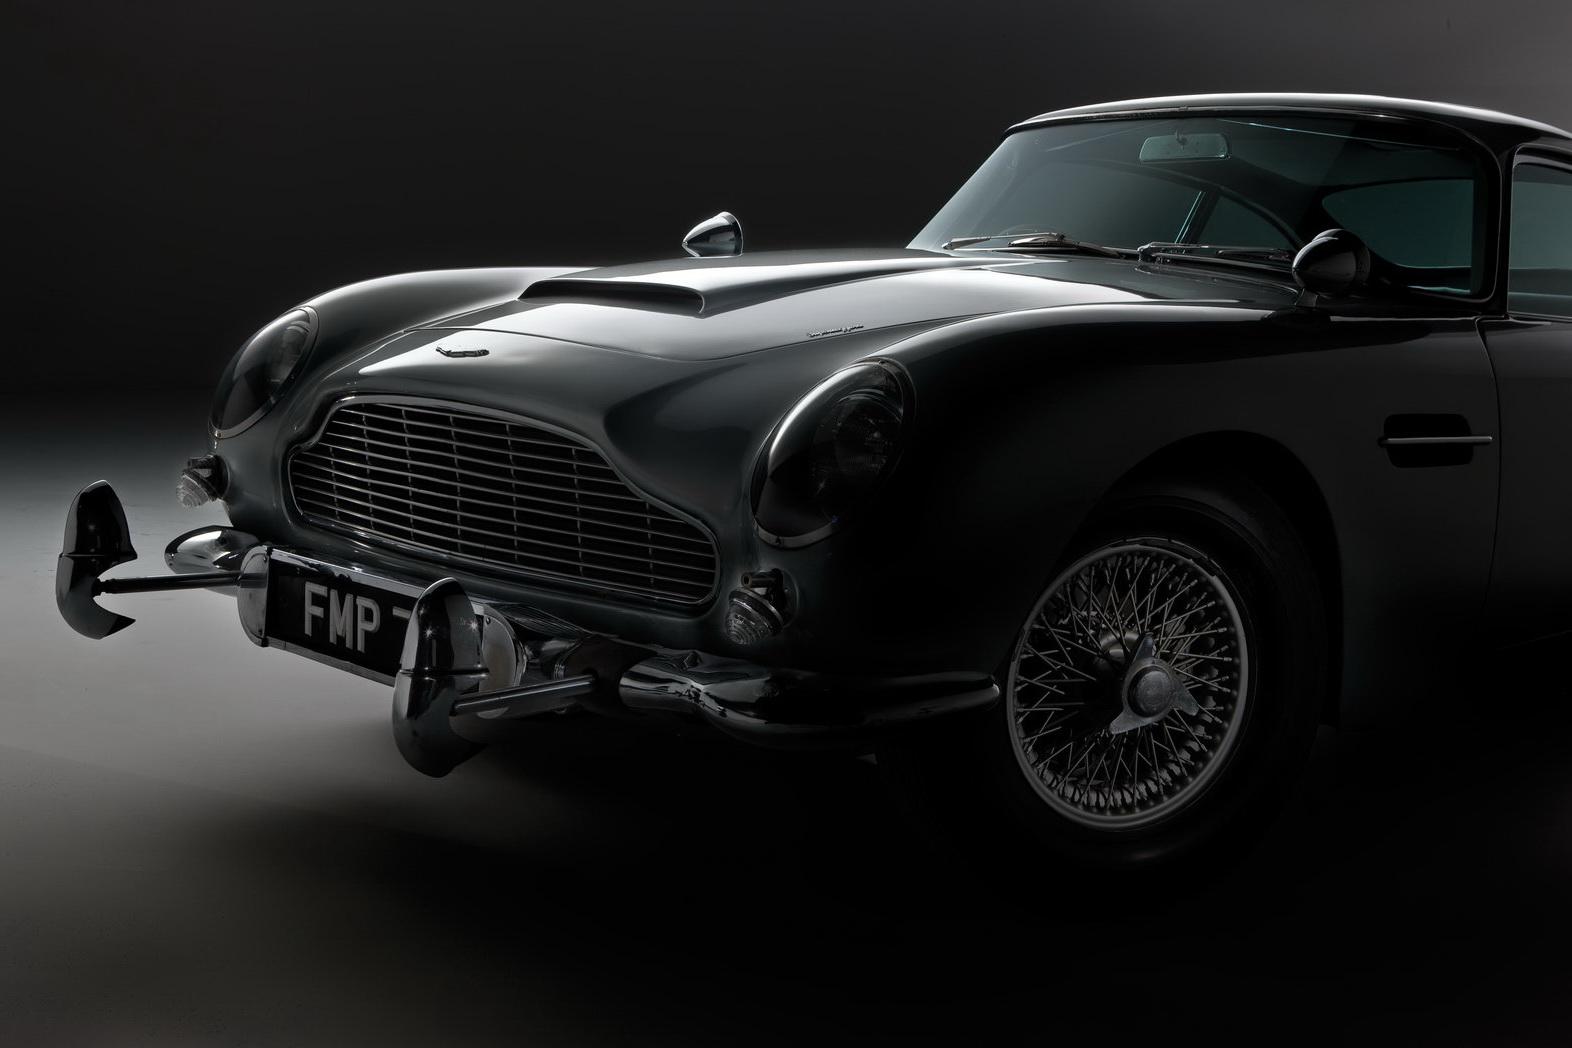 james bond 1964 aston martin db5 116 james bonds original 007 aston. Cars Review. Best American Auto & Cars Review